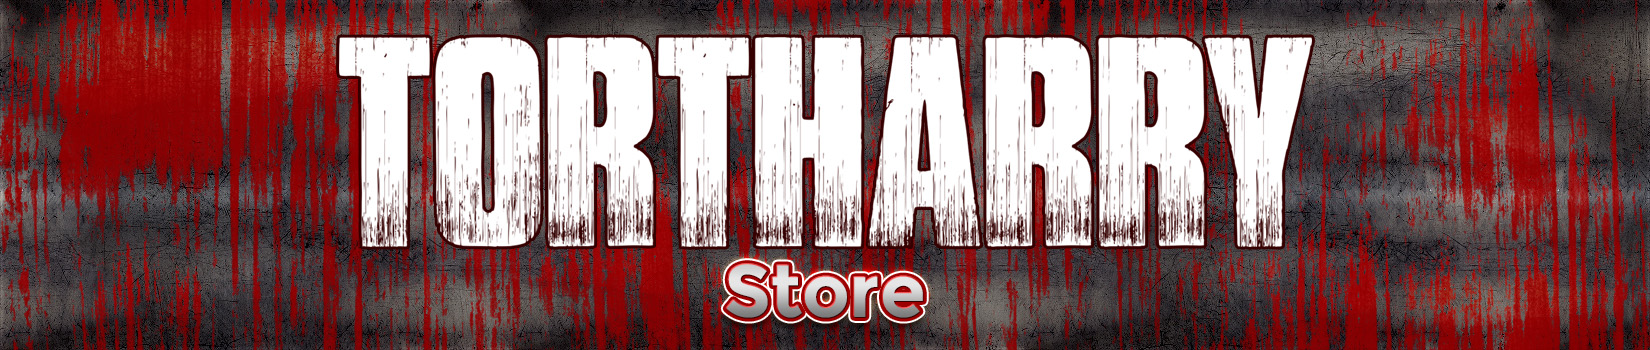 Tortharry Store